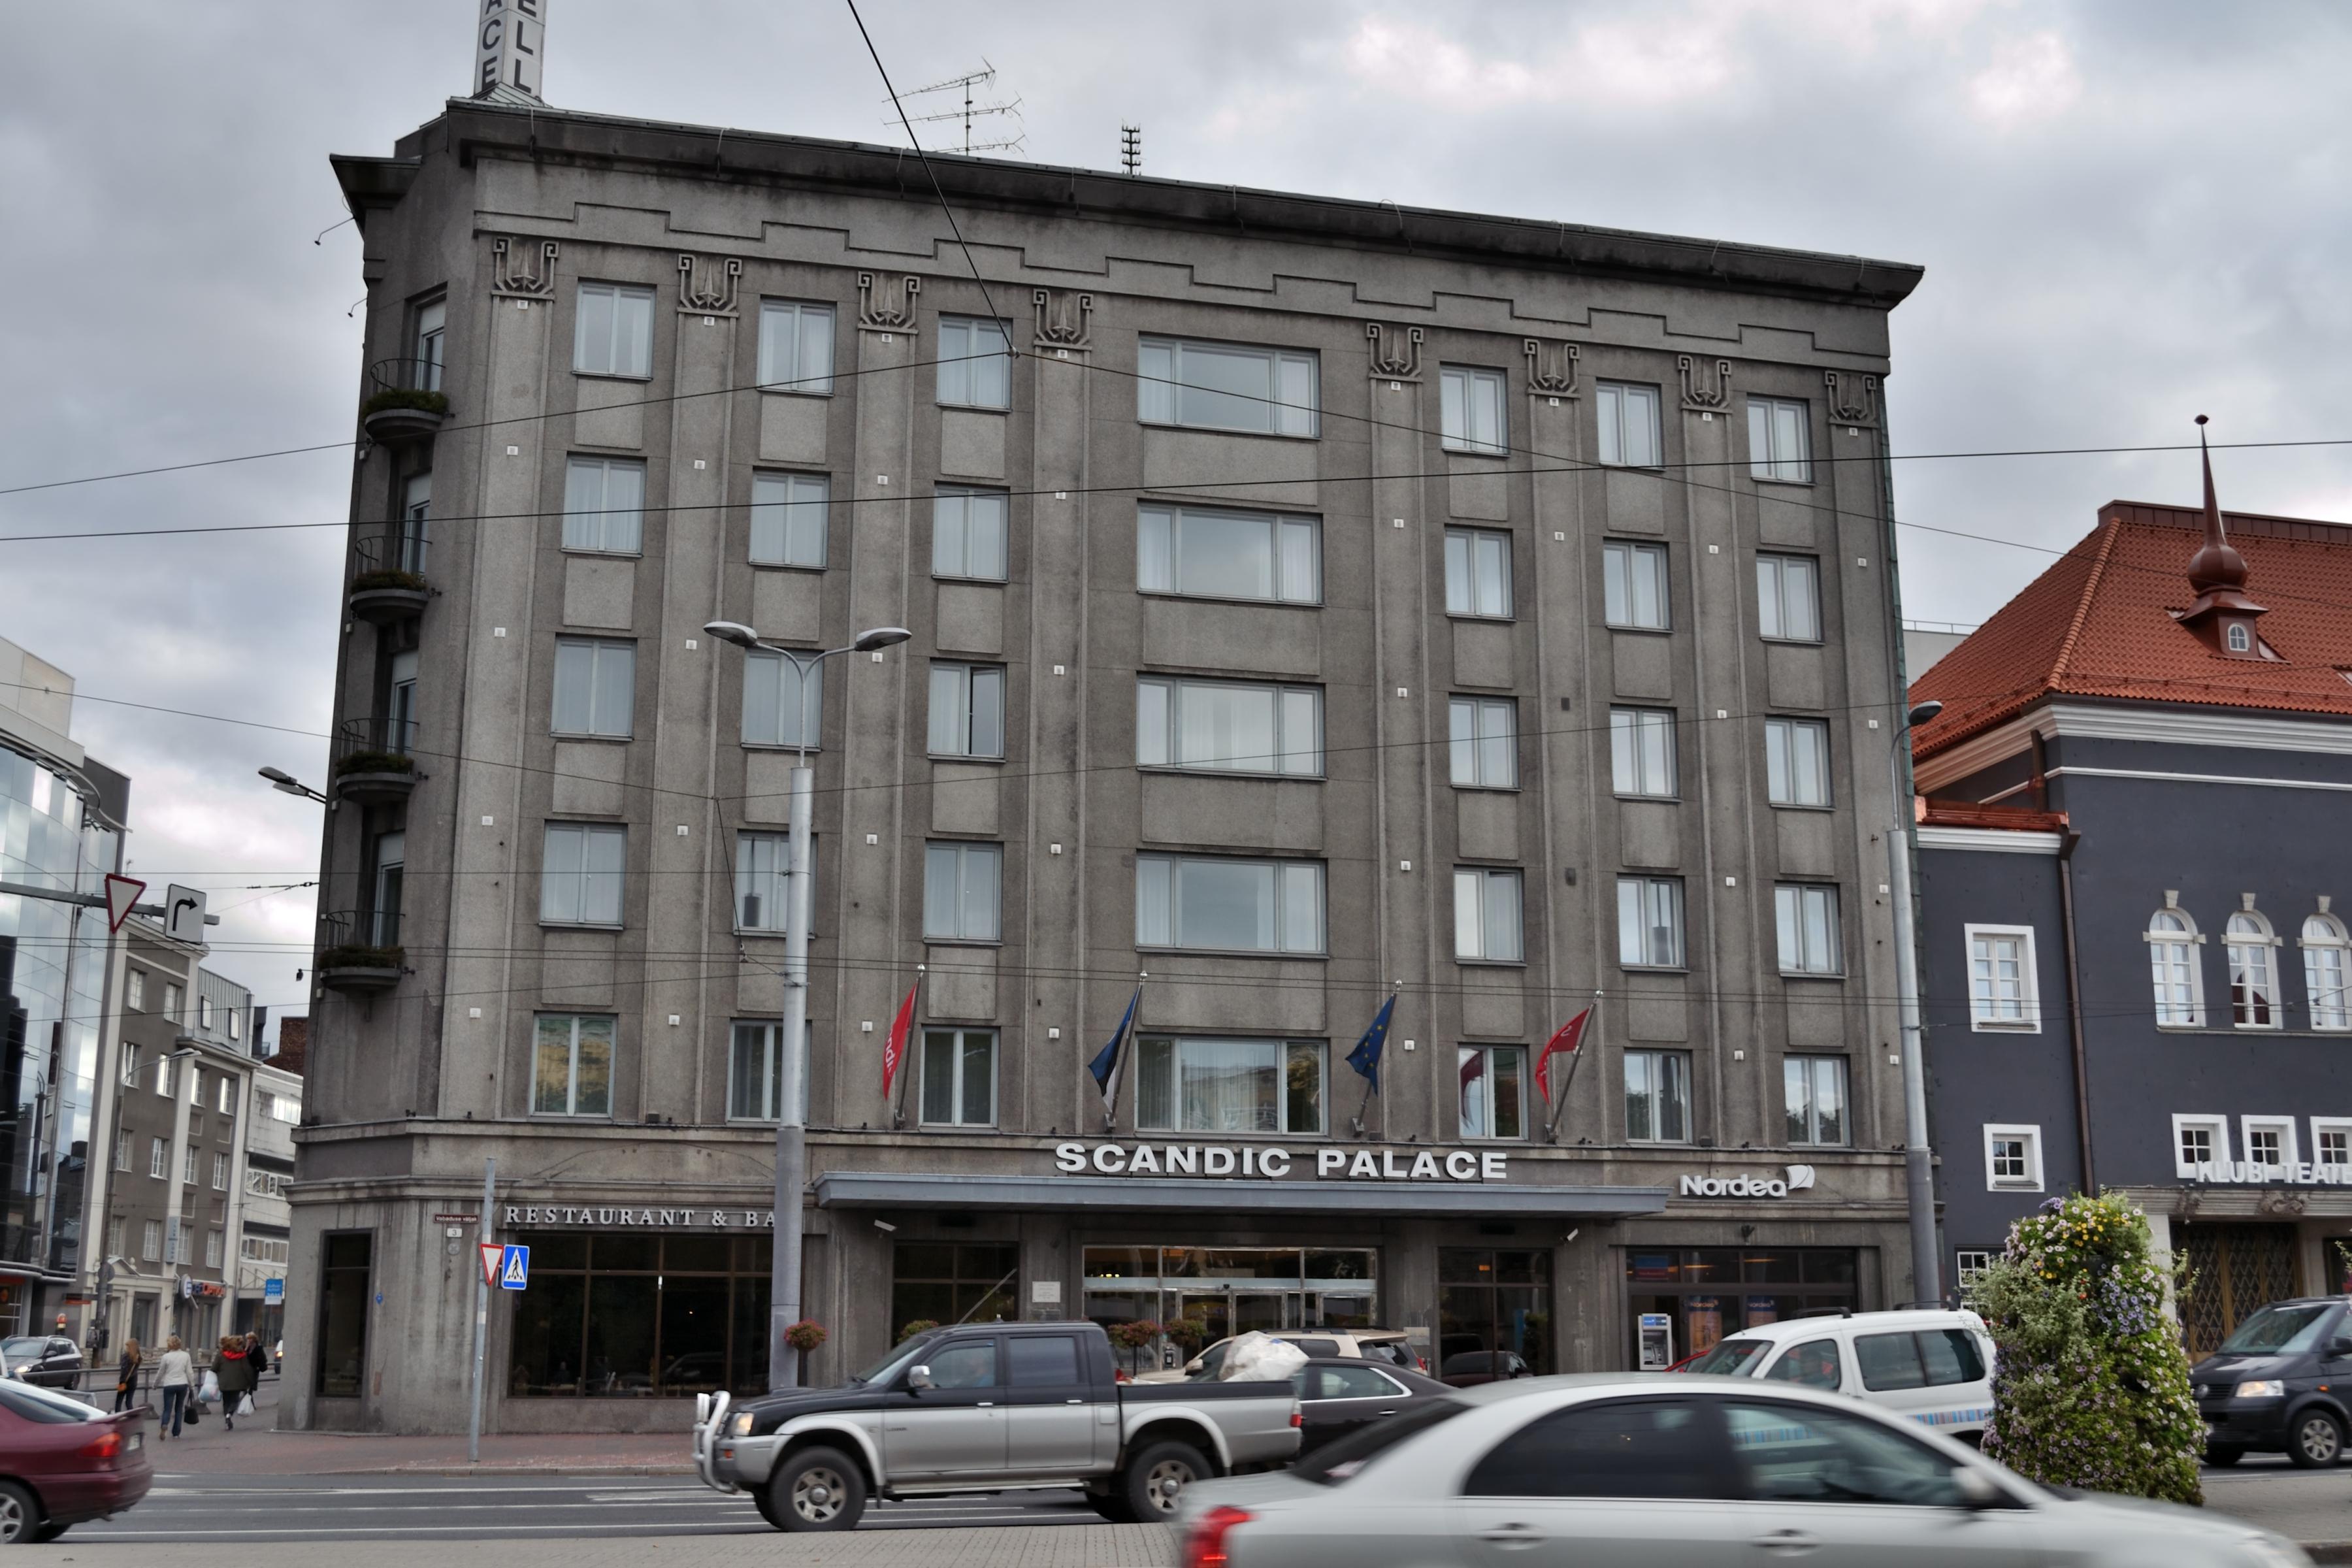 Scandic Palace Hotel Copenhagen Tripadvisor